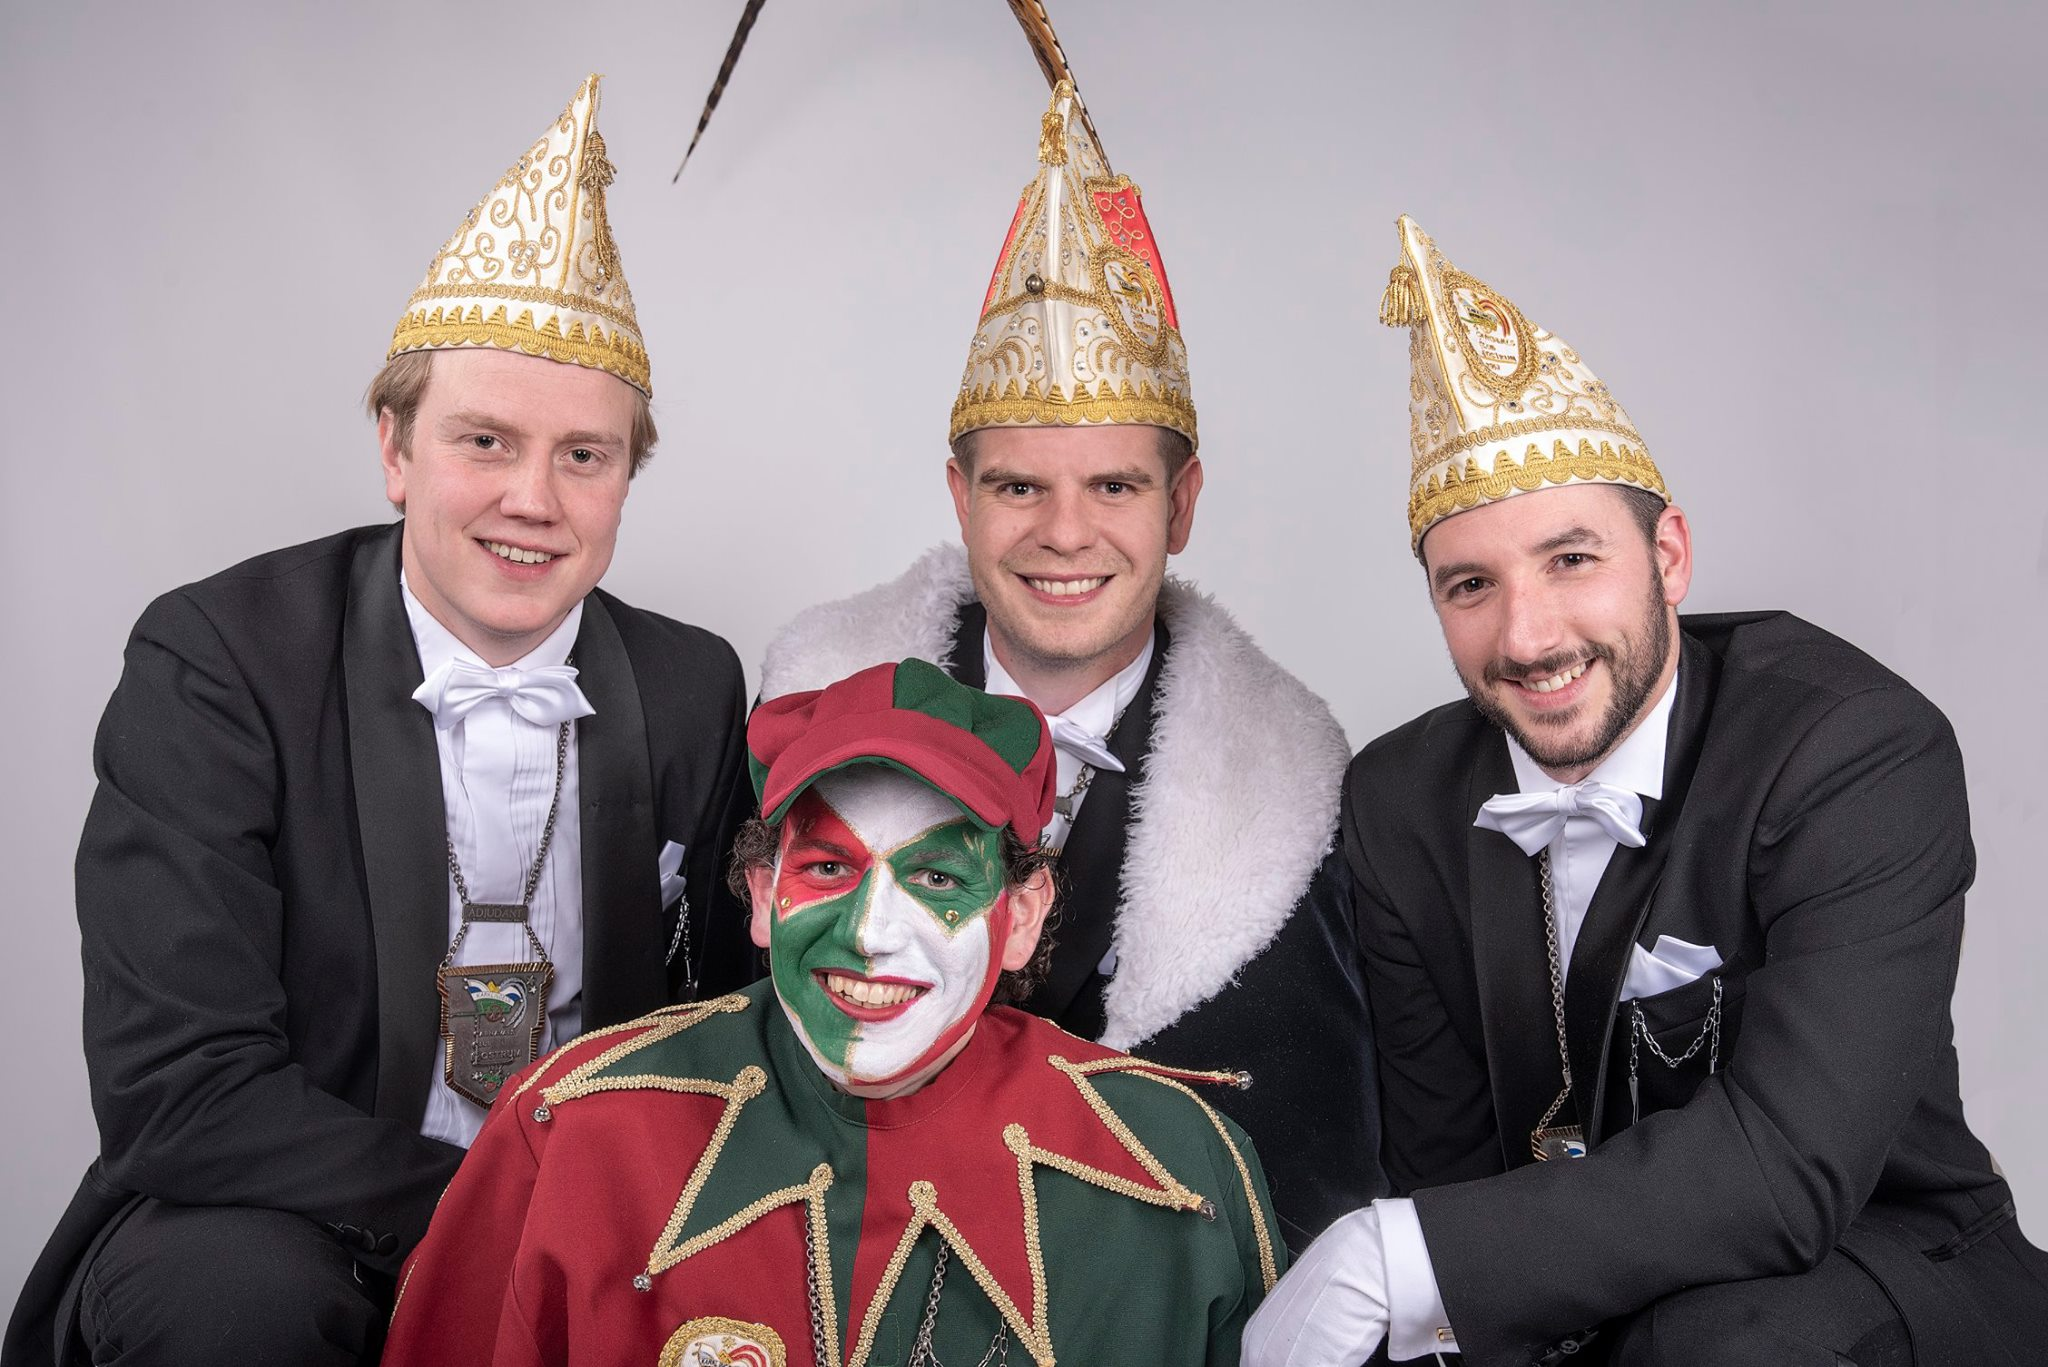 Niet te geloven: nog een Prins Carnaval in ons  …